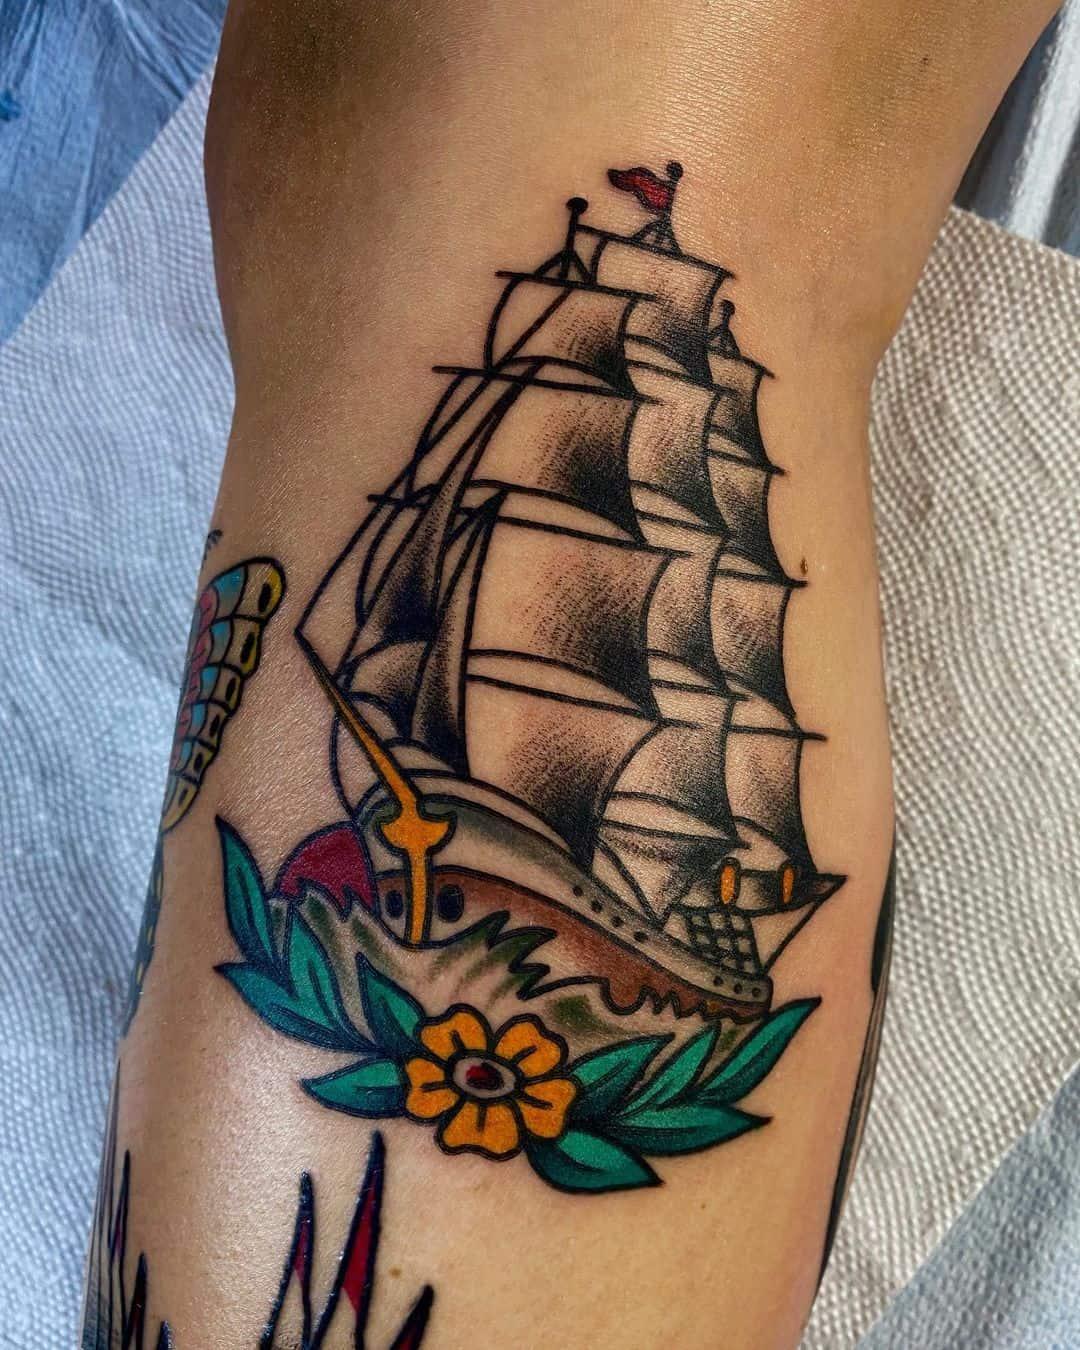 Ship tattoo 2